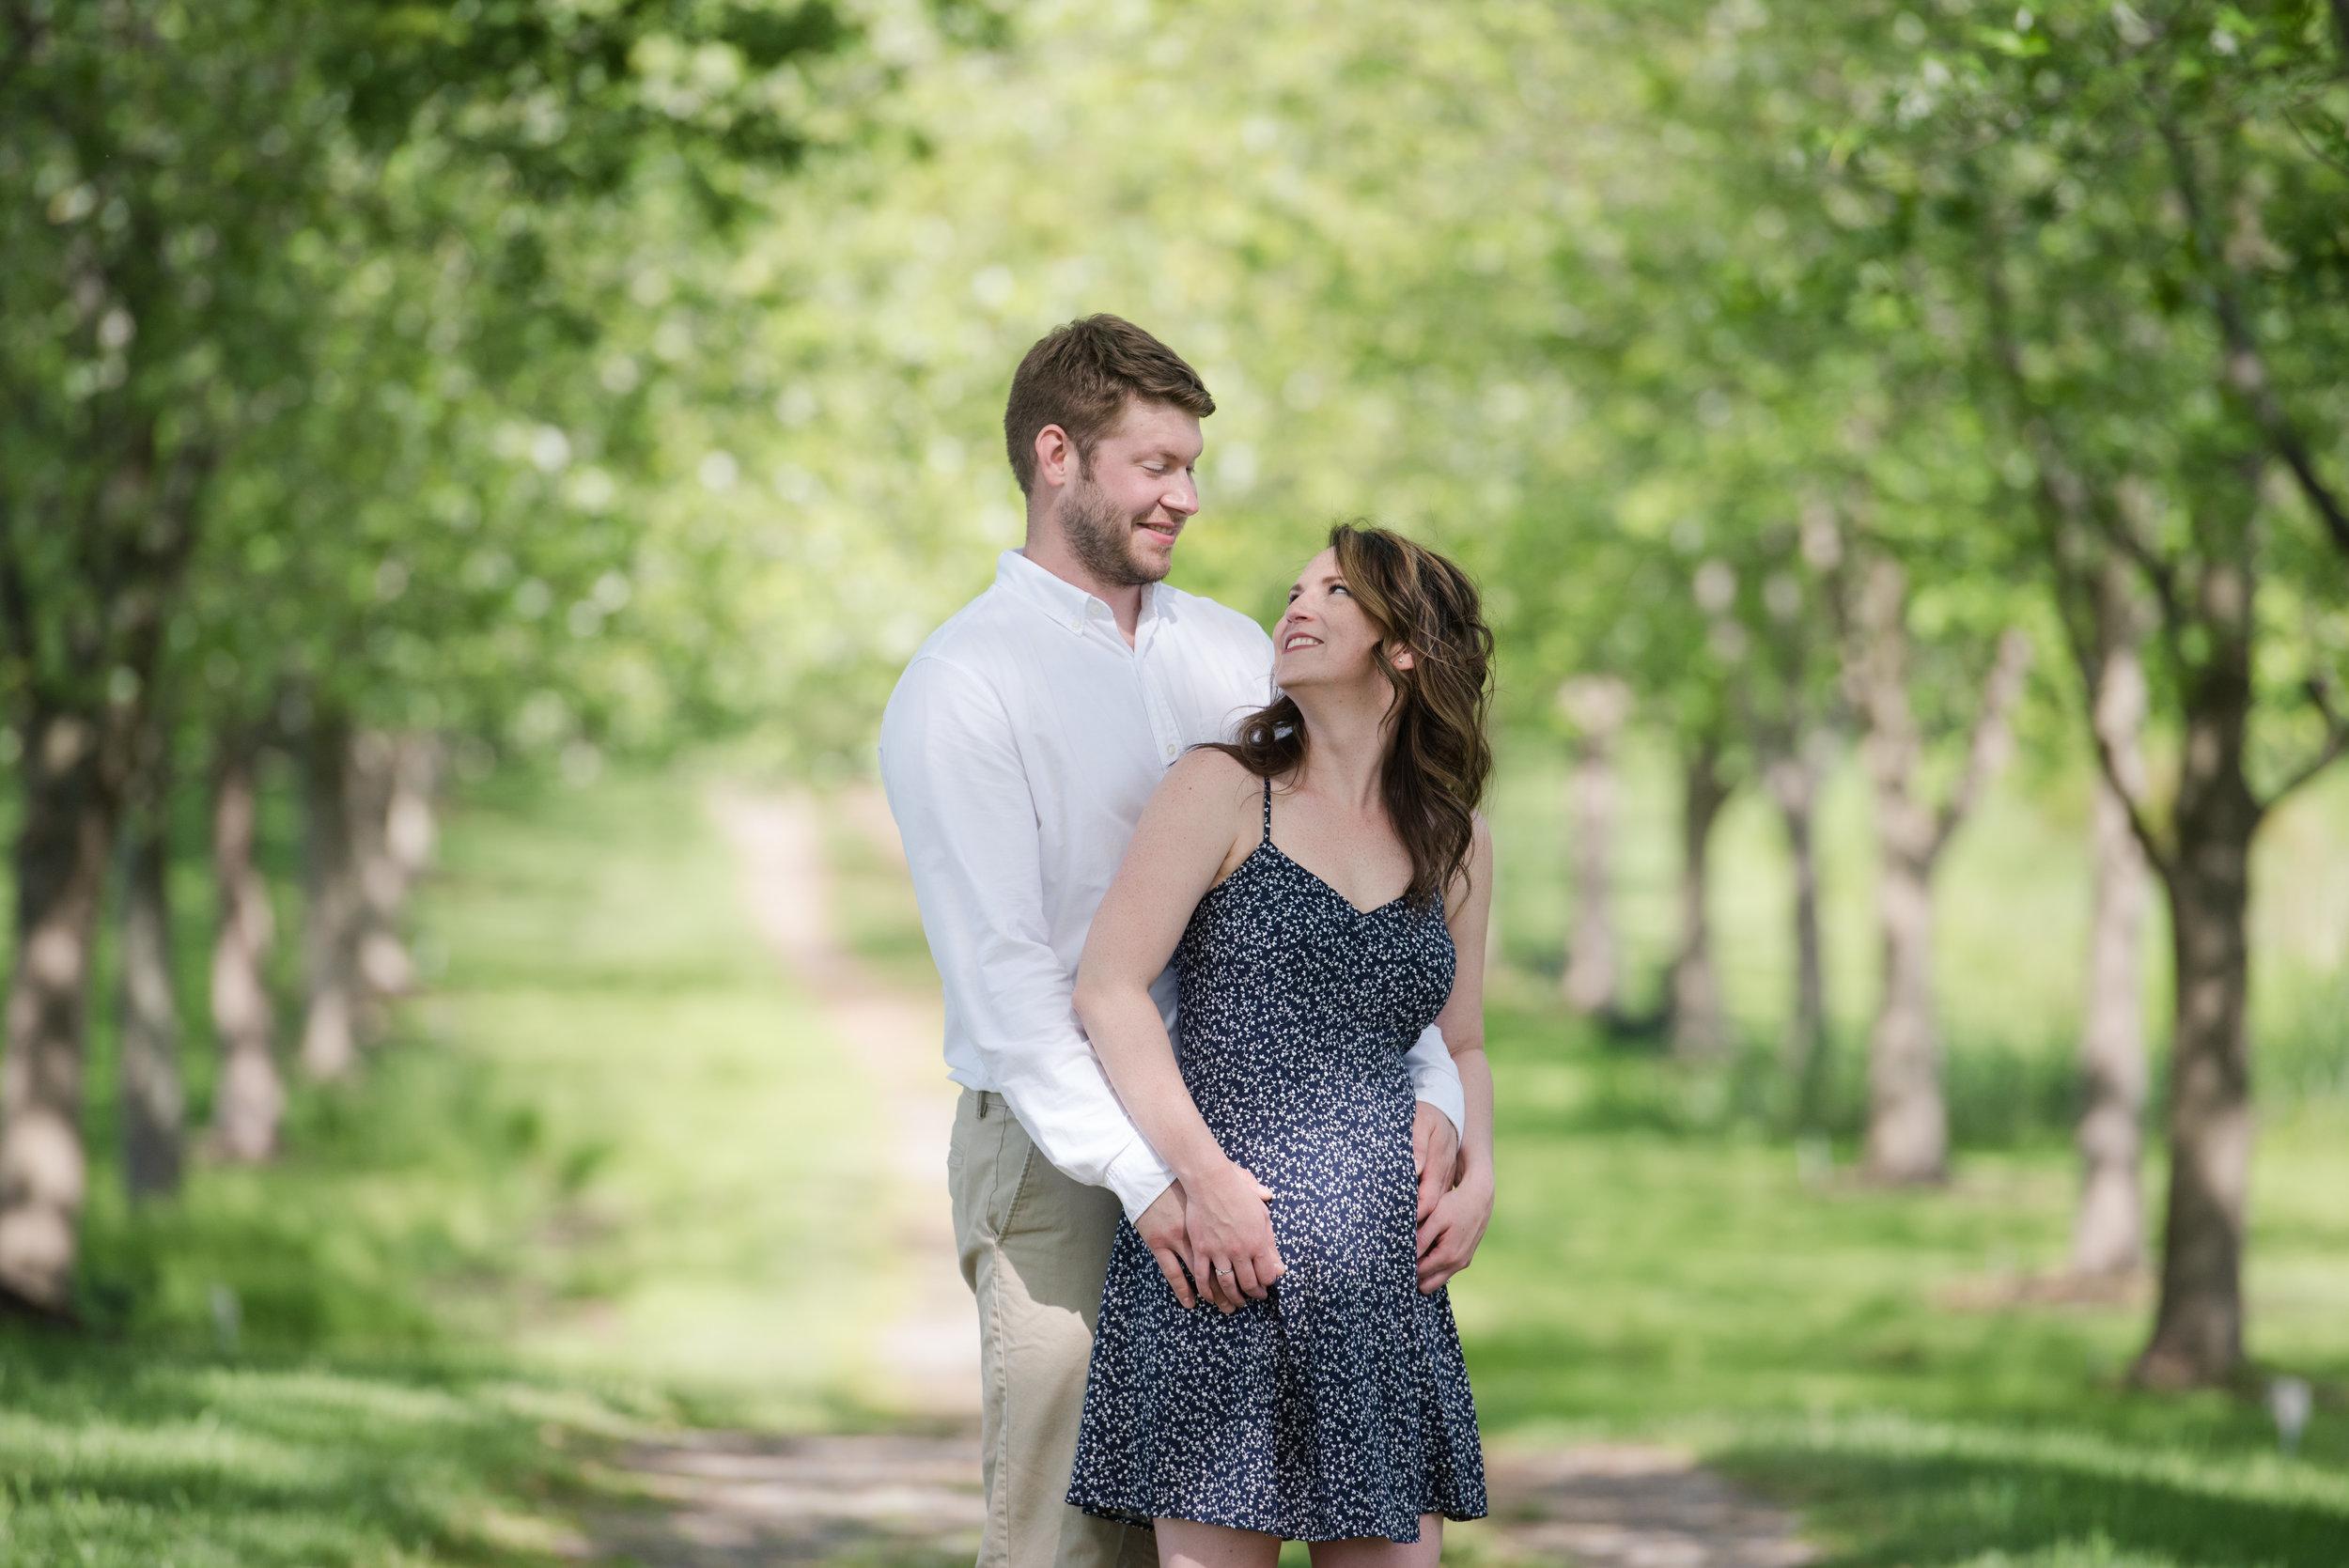 GALLERY-2019-6-9 Kaitlin, Justin & Liam Engagement 0839 122.jpg